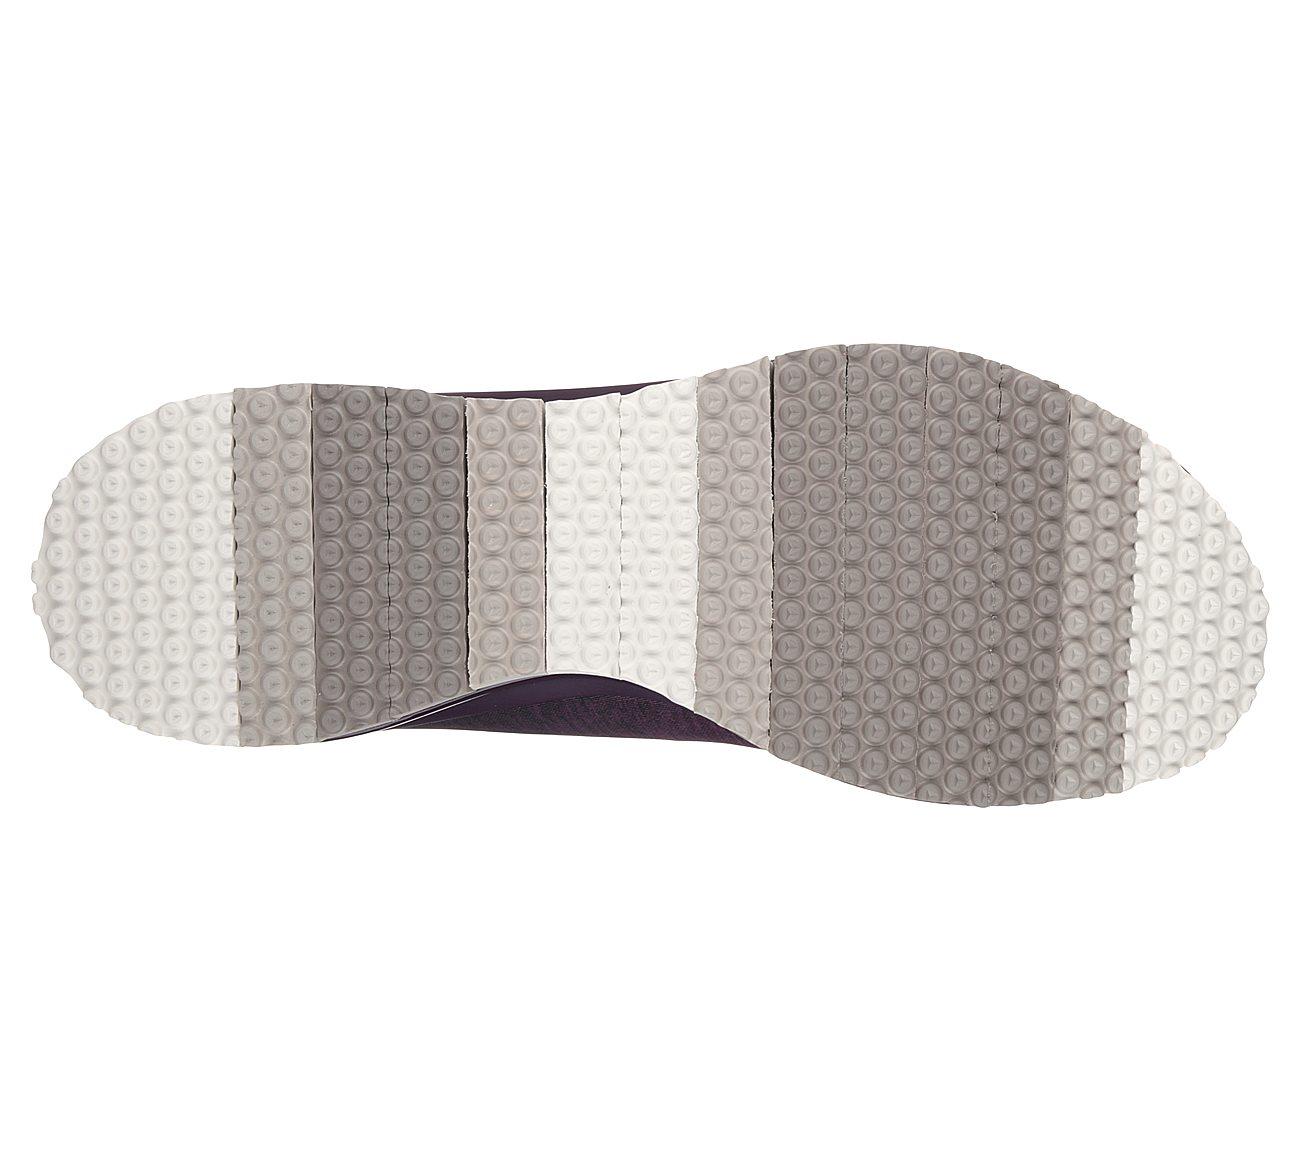 Buy SKECHERS Skechers GO FLEX Walk - Muse Skechers Performance Shoes ... c7eebbbd4